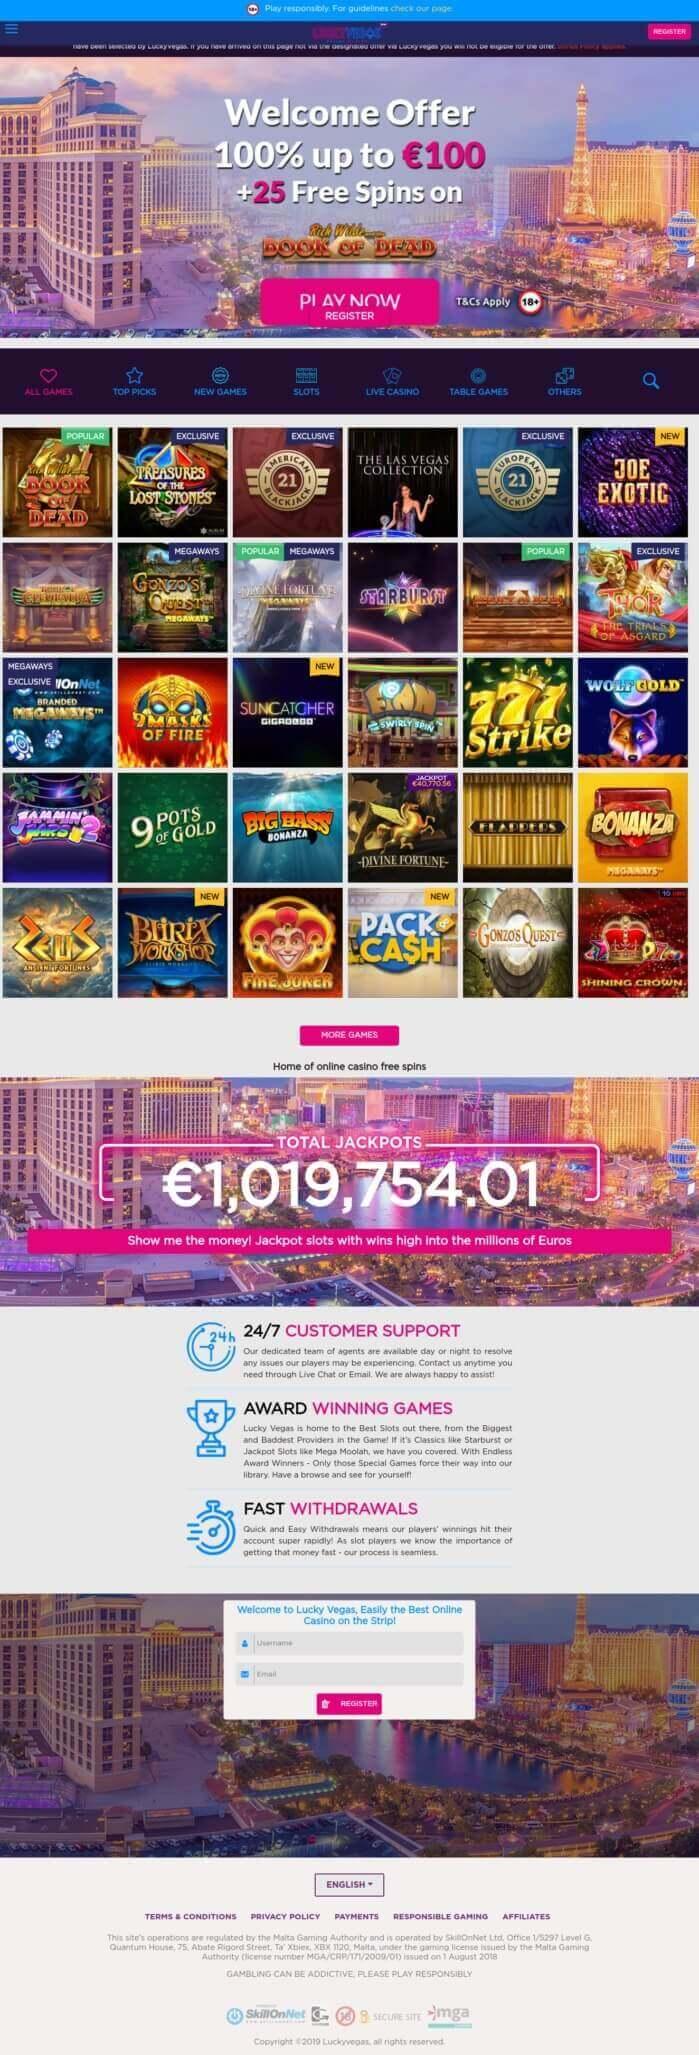 True Players Choose Online Casino Lucky Vegas Review